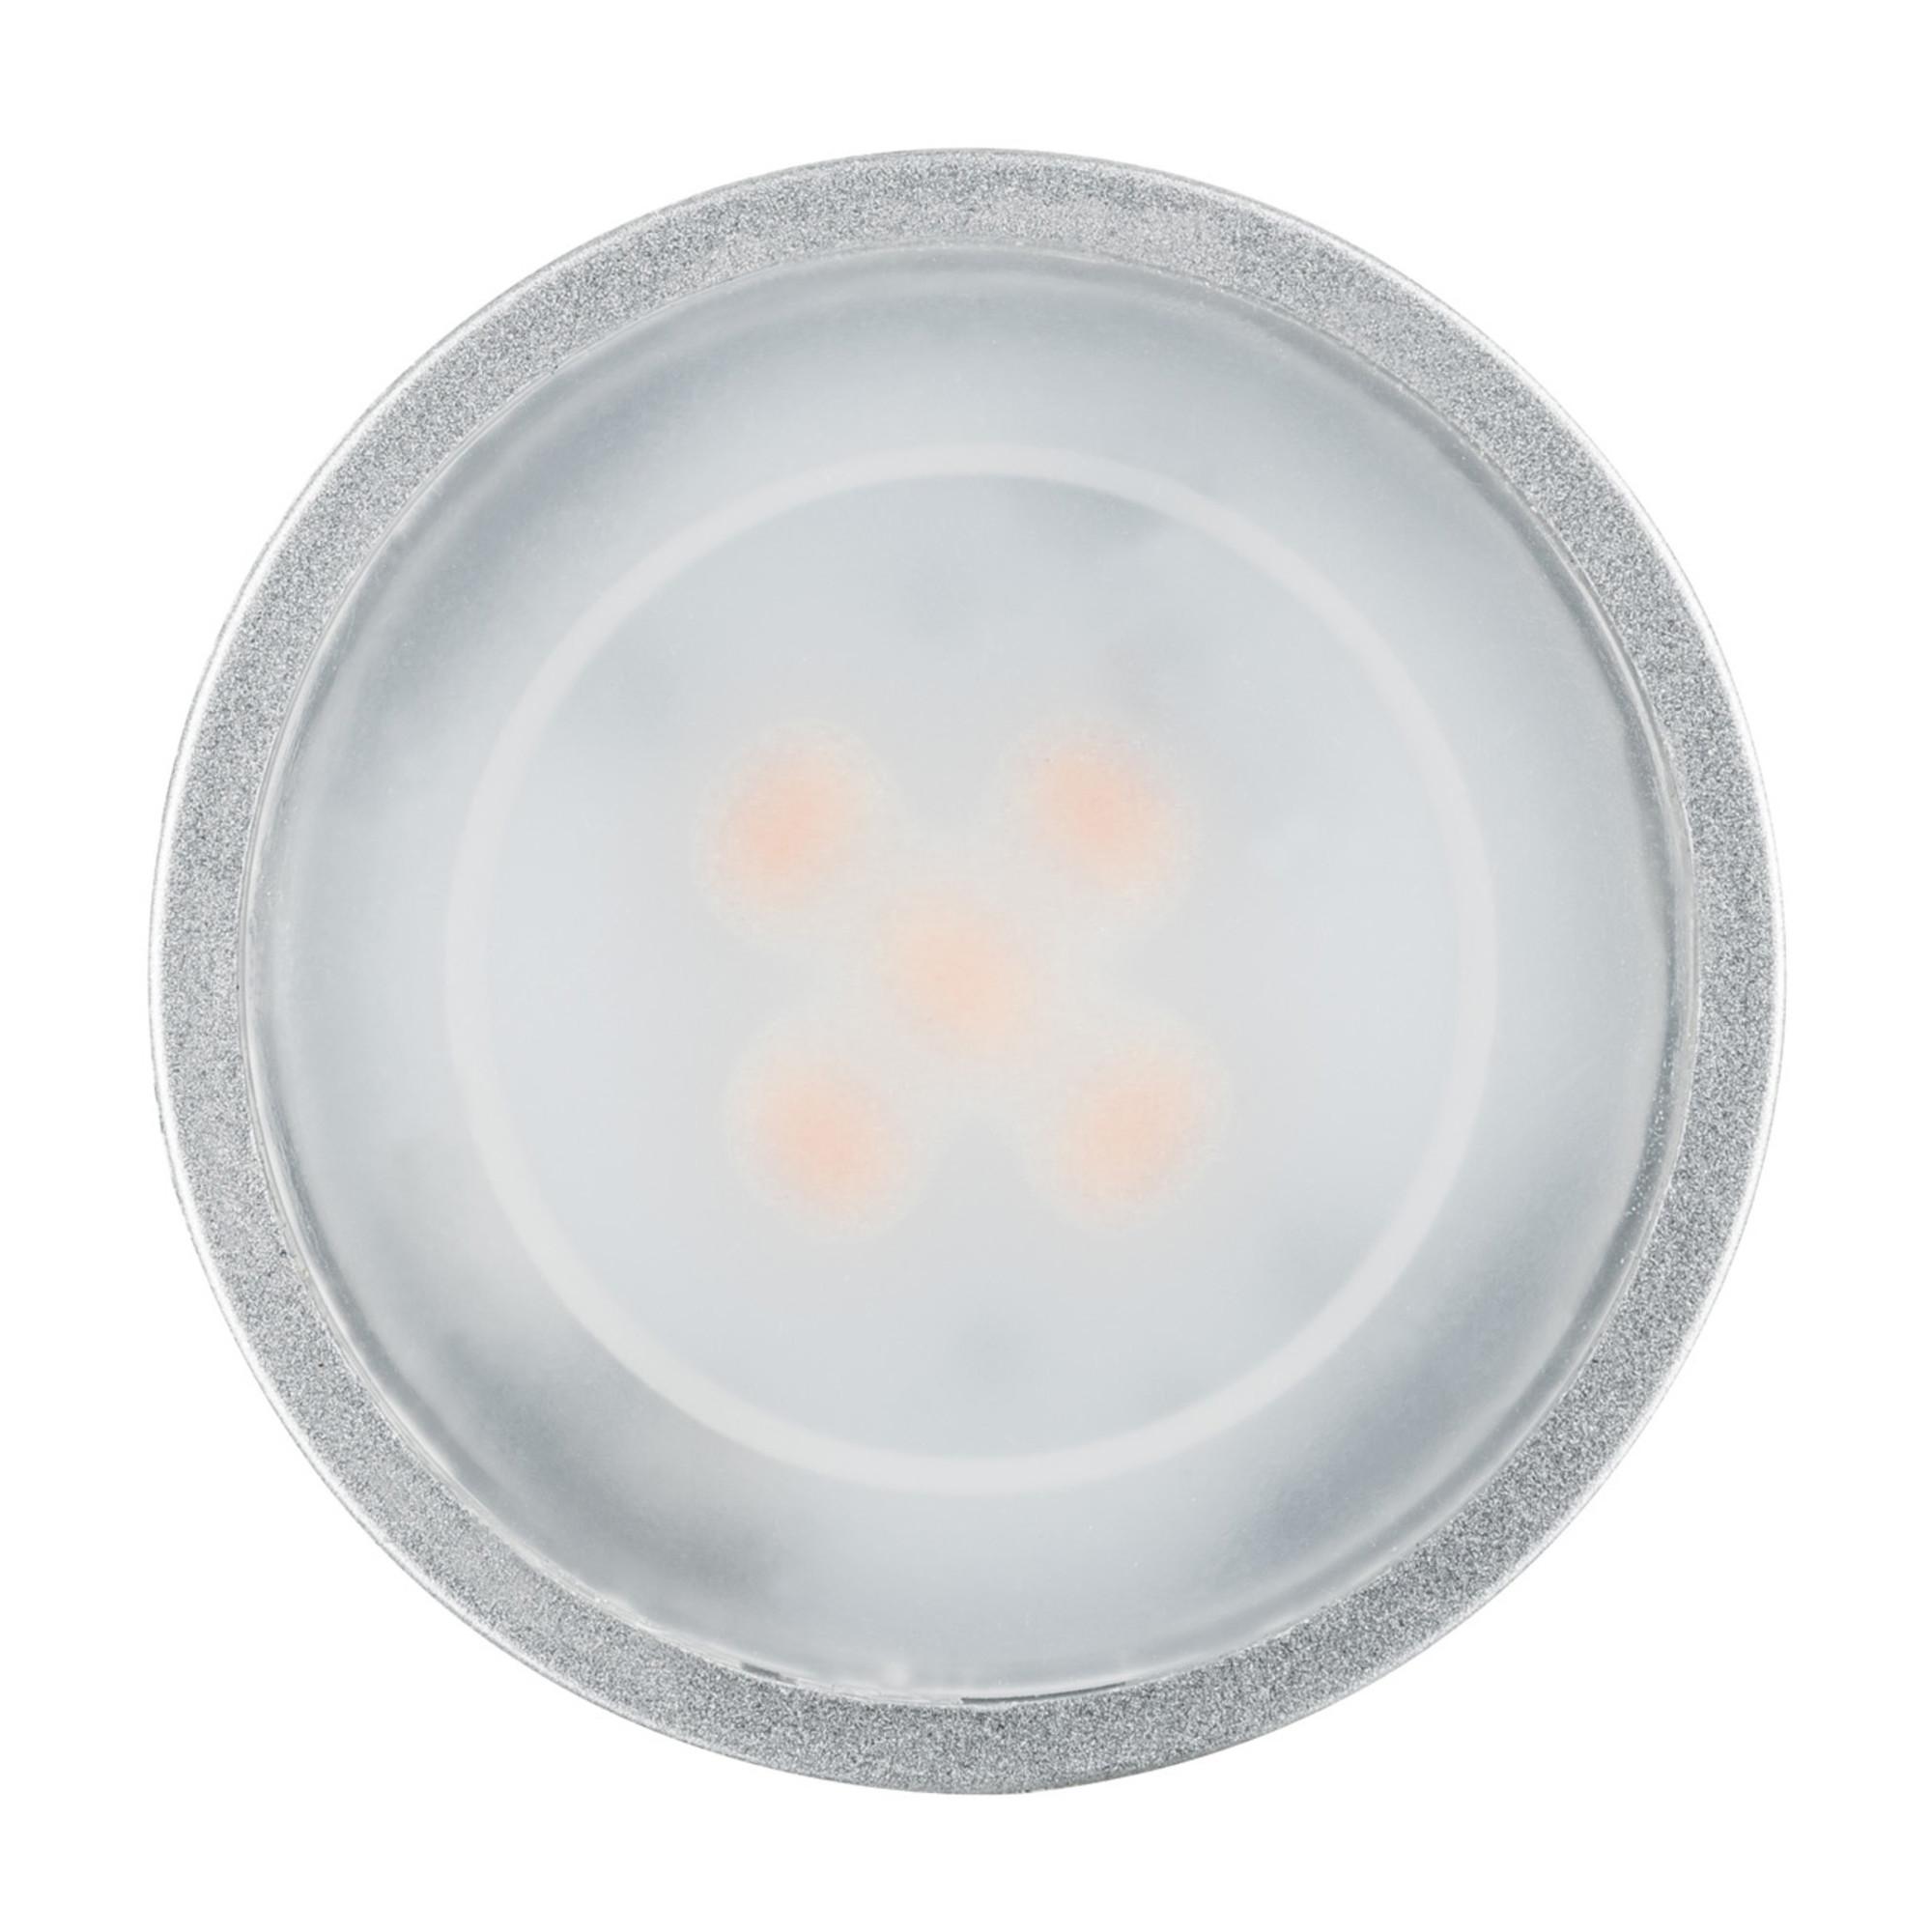 Лампа светодиодная Paulmann 28232 GU10 135 Лм теплый свет